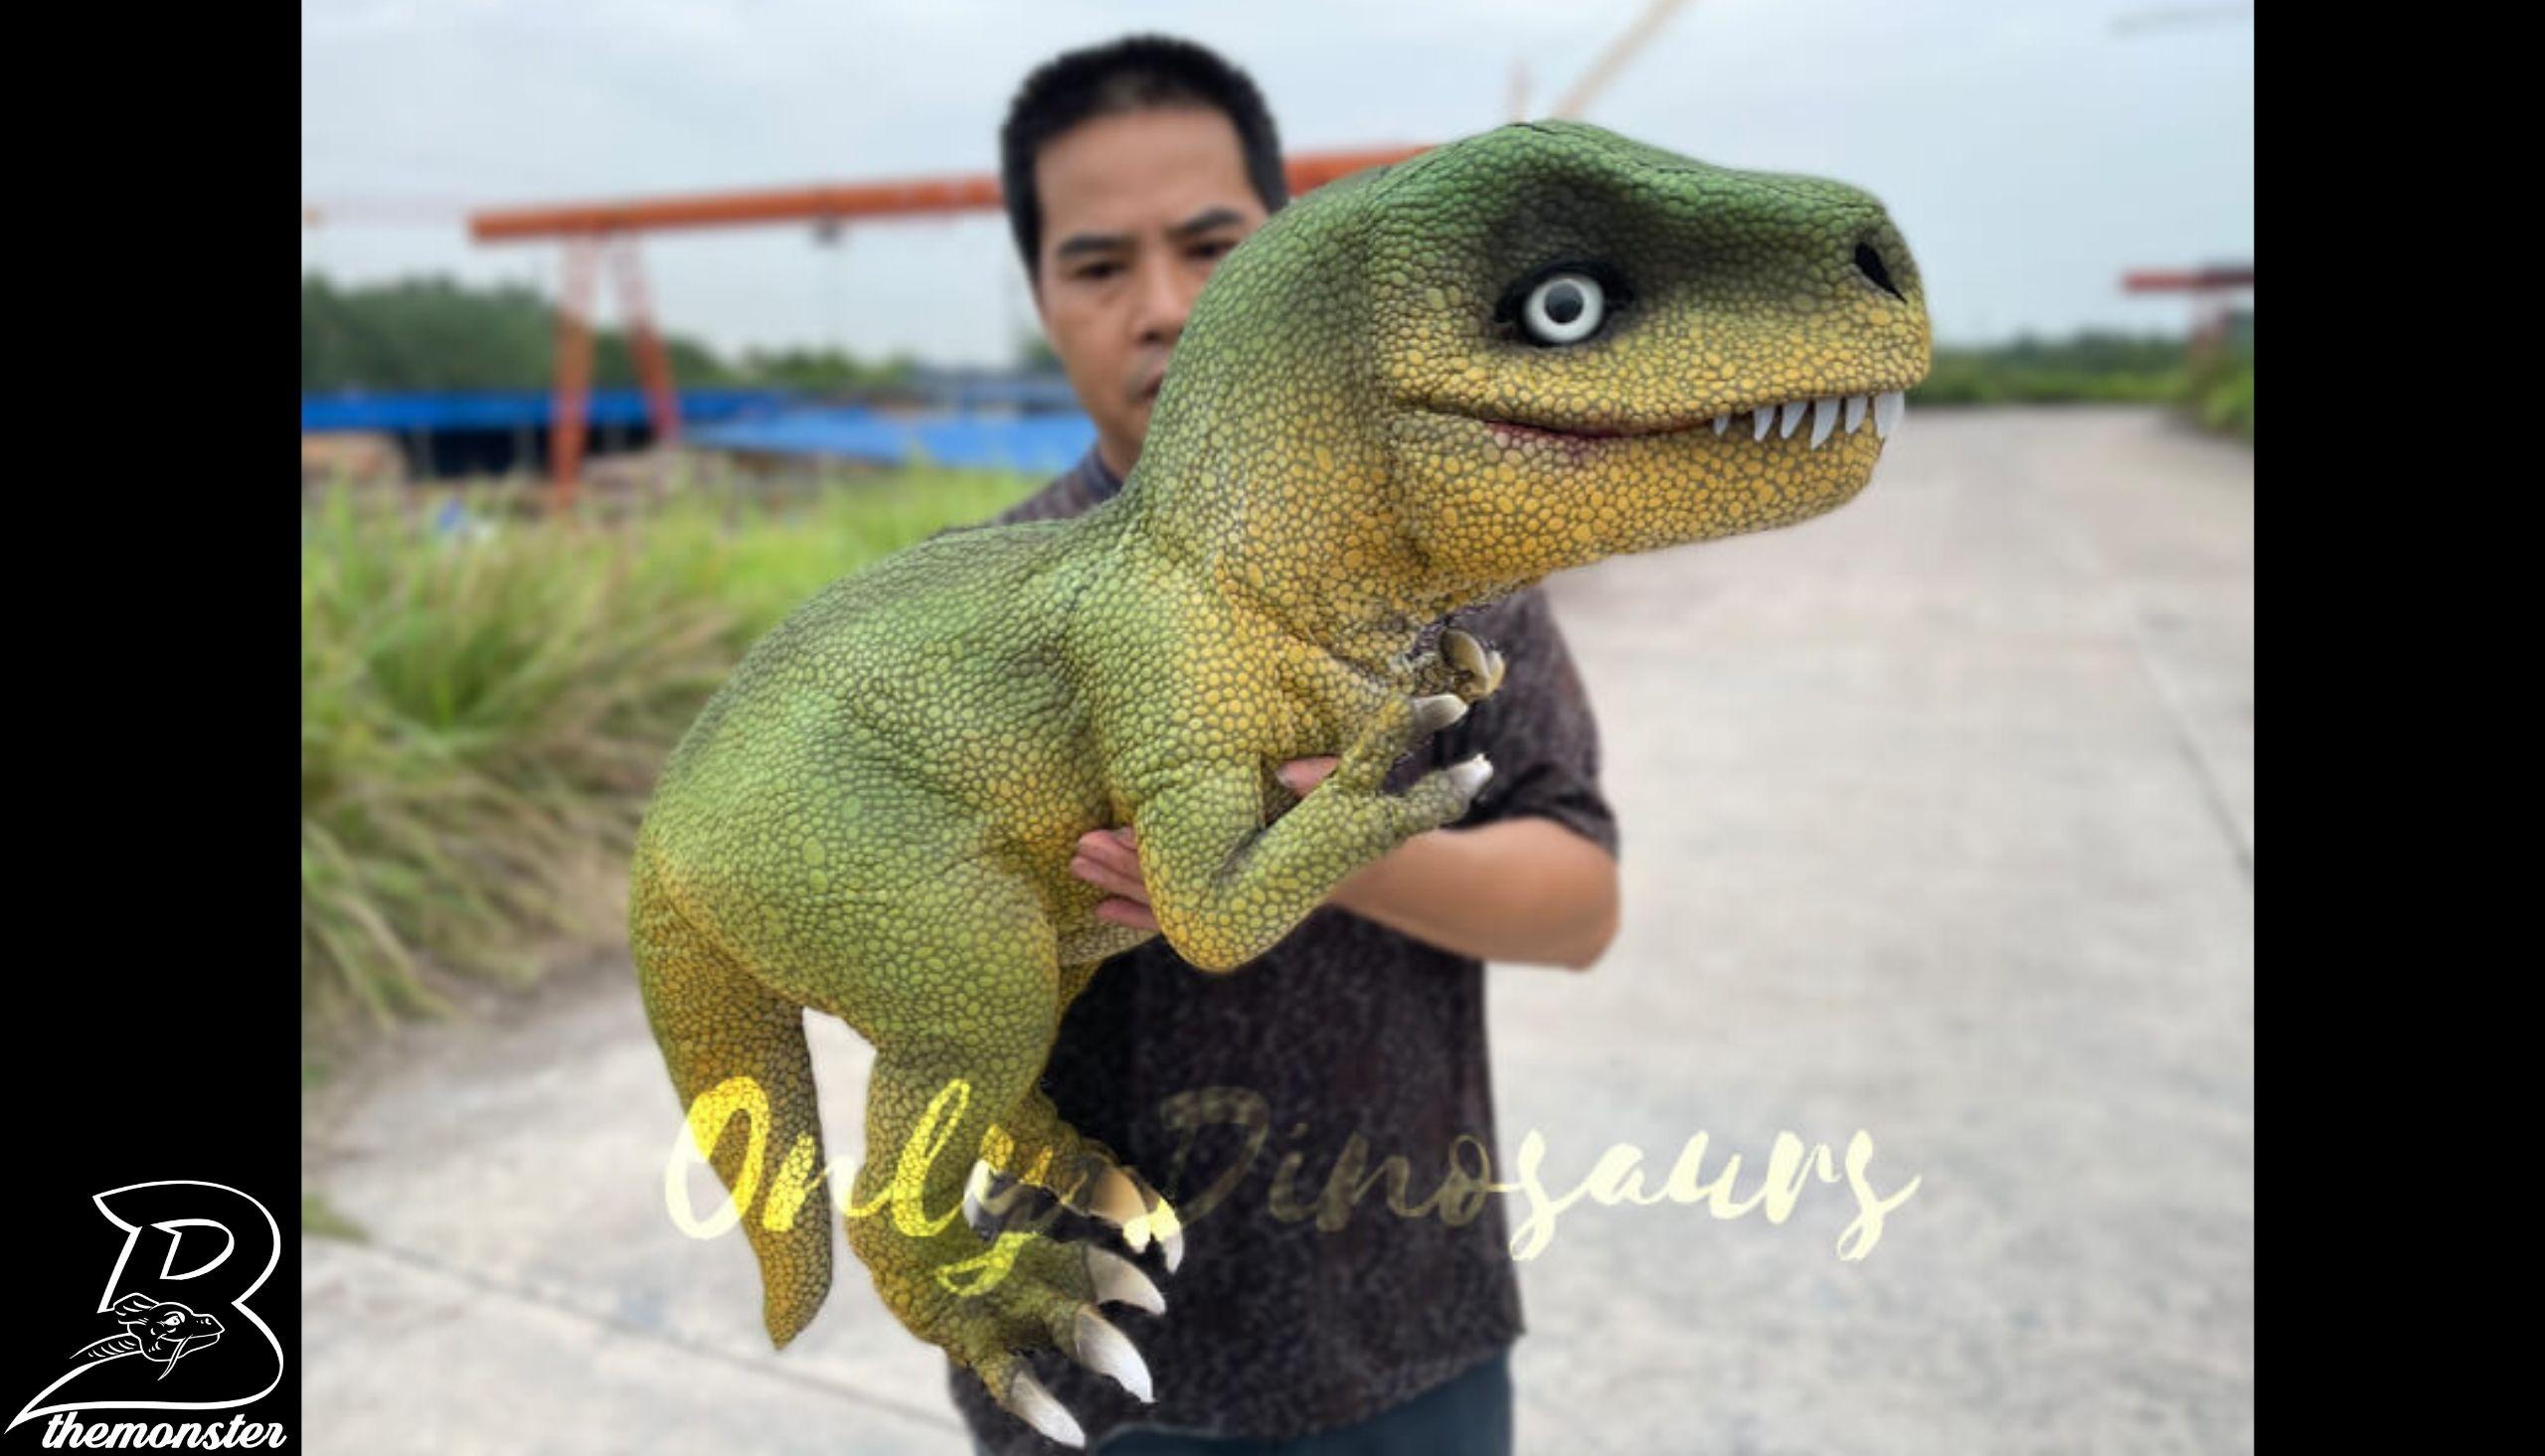 Adorable T-Rex Hand Puppet in vendita sul Bthemonster.com